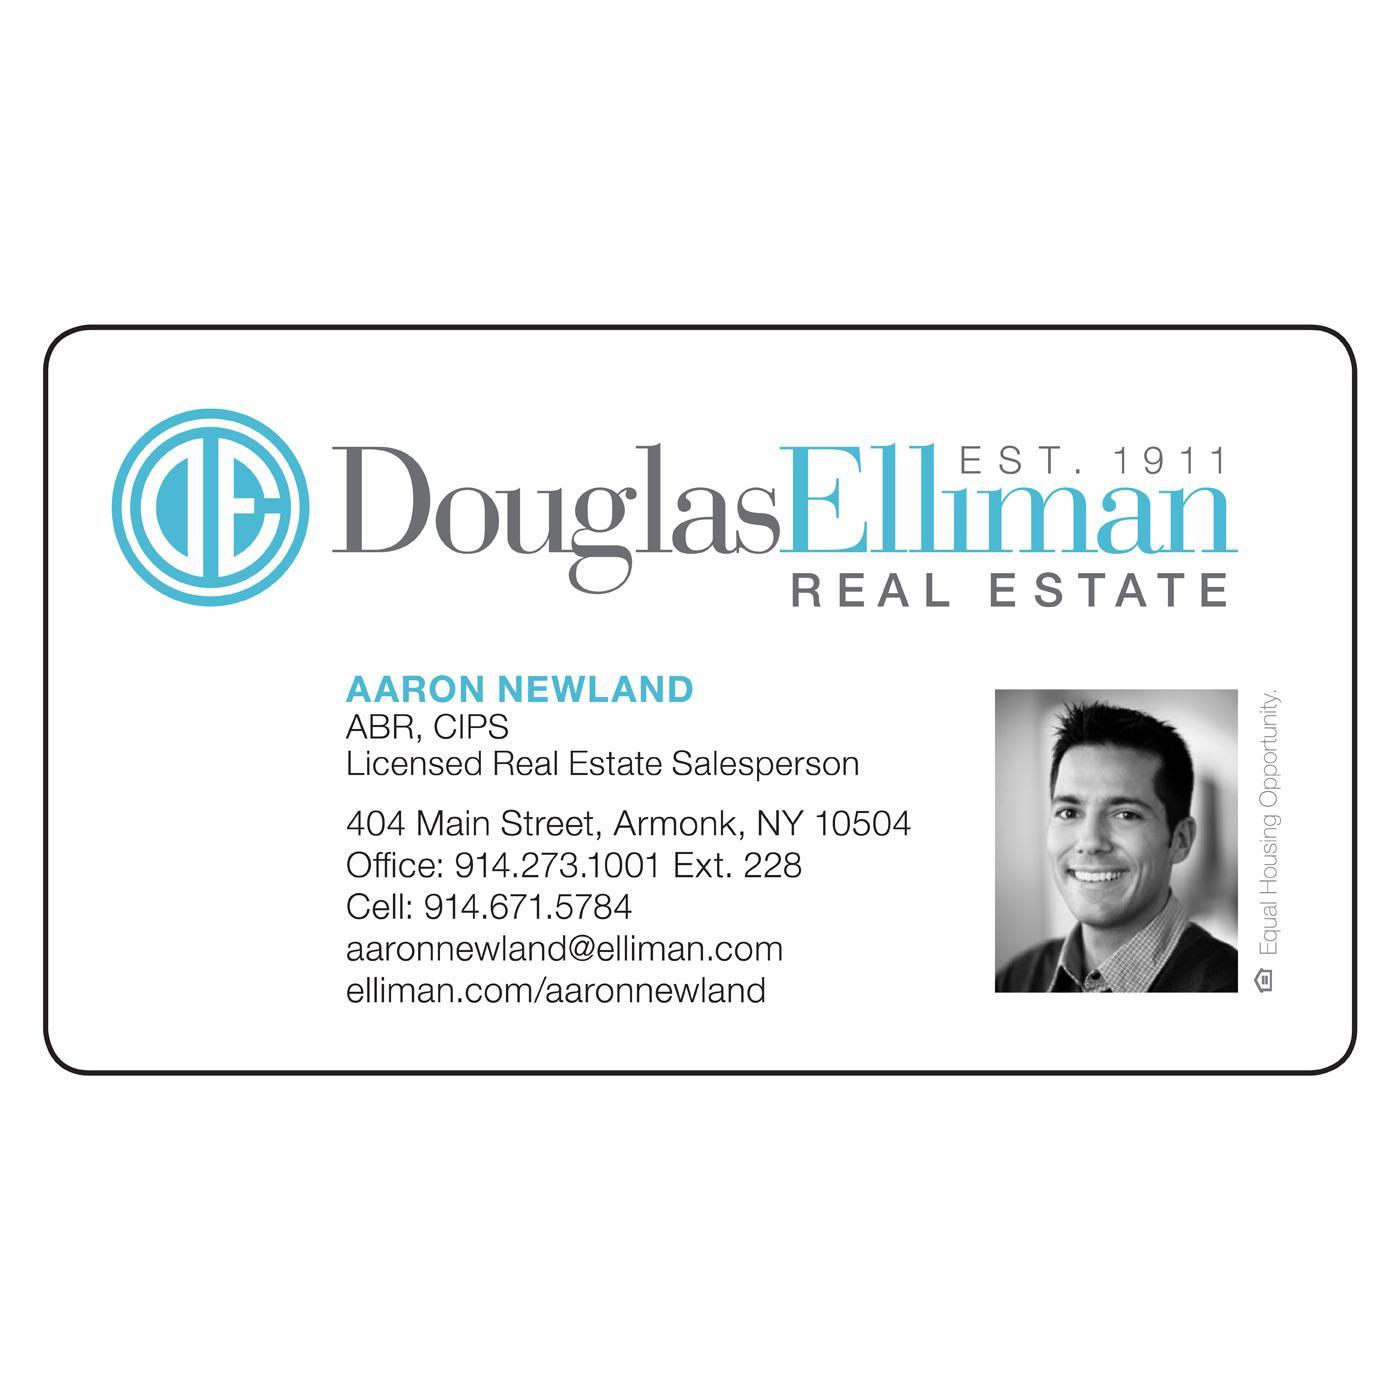 Douglas elliman magnetic business card magnets usa douglas elliman magnetic business card colourmoves